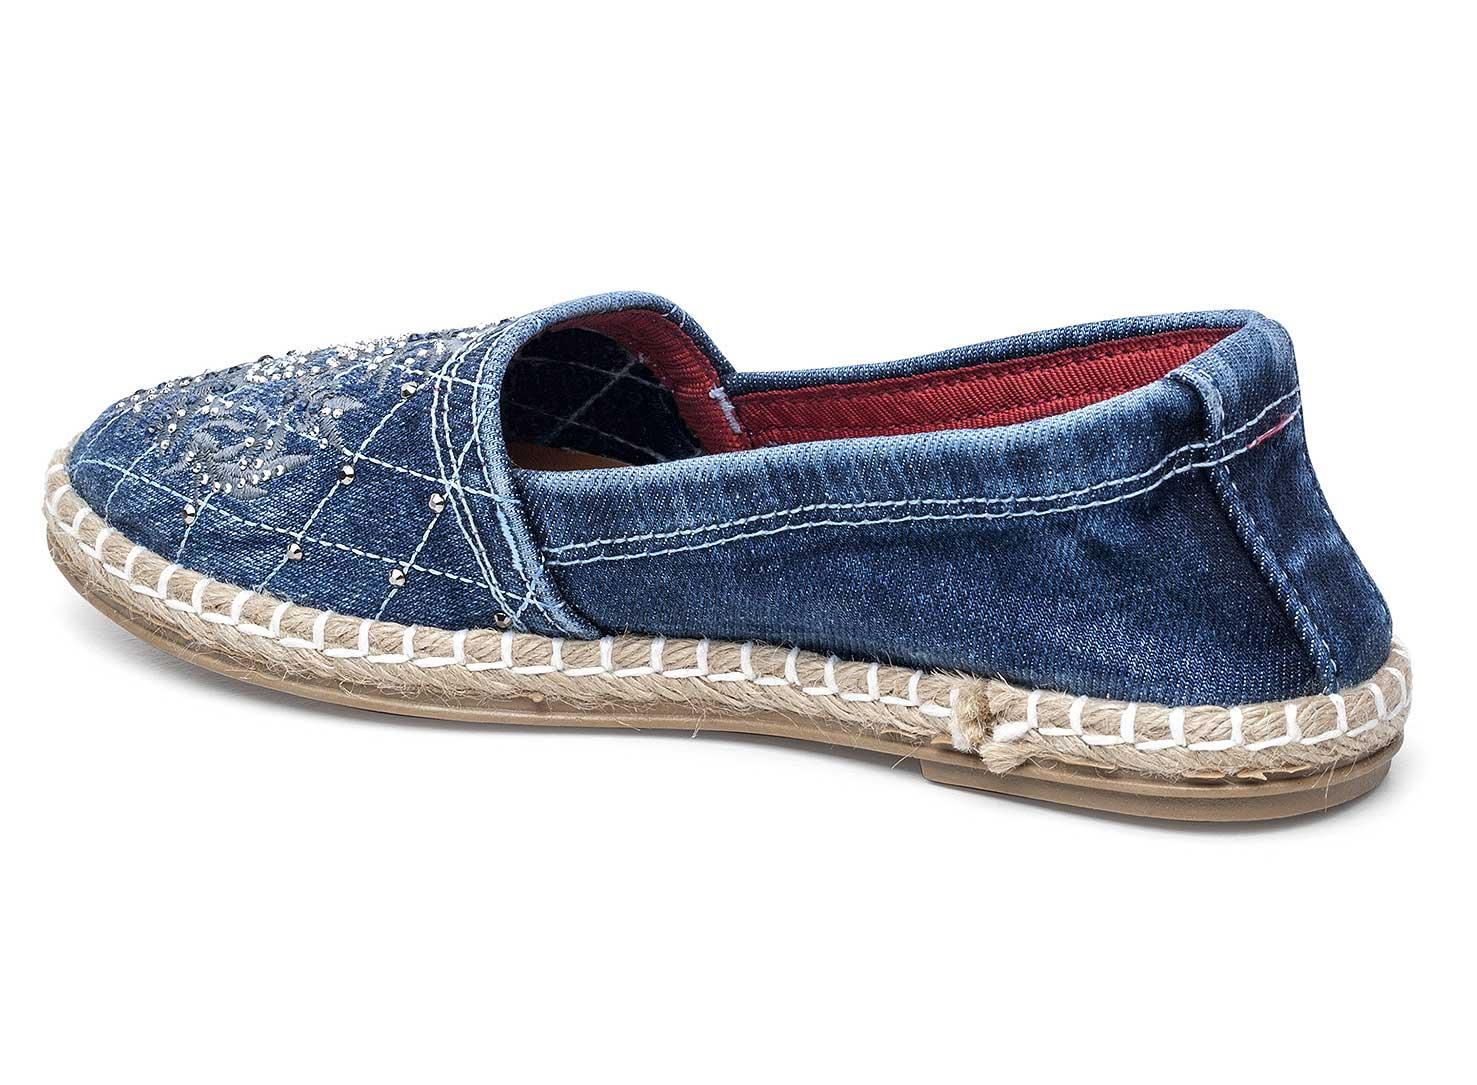 2d2a22f4e52f2 Jeansové riflové topánky dámske 40C-294. 40C294.jpg. 40C294.jpg;  40C294_b.jpg ...